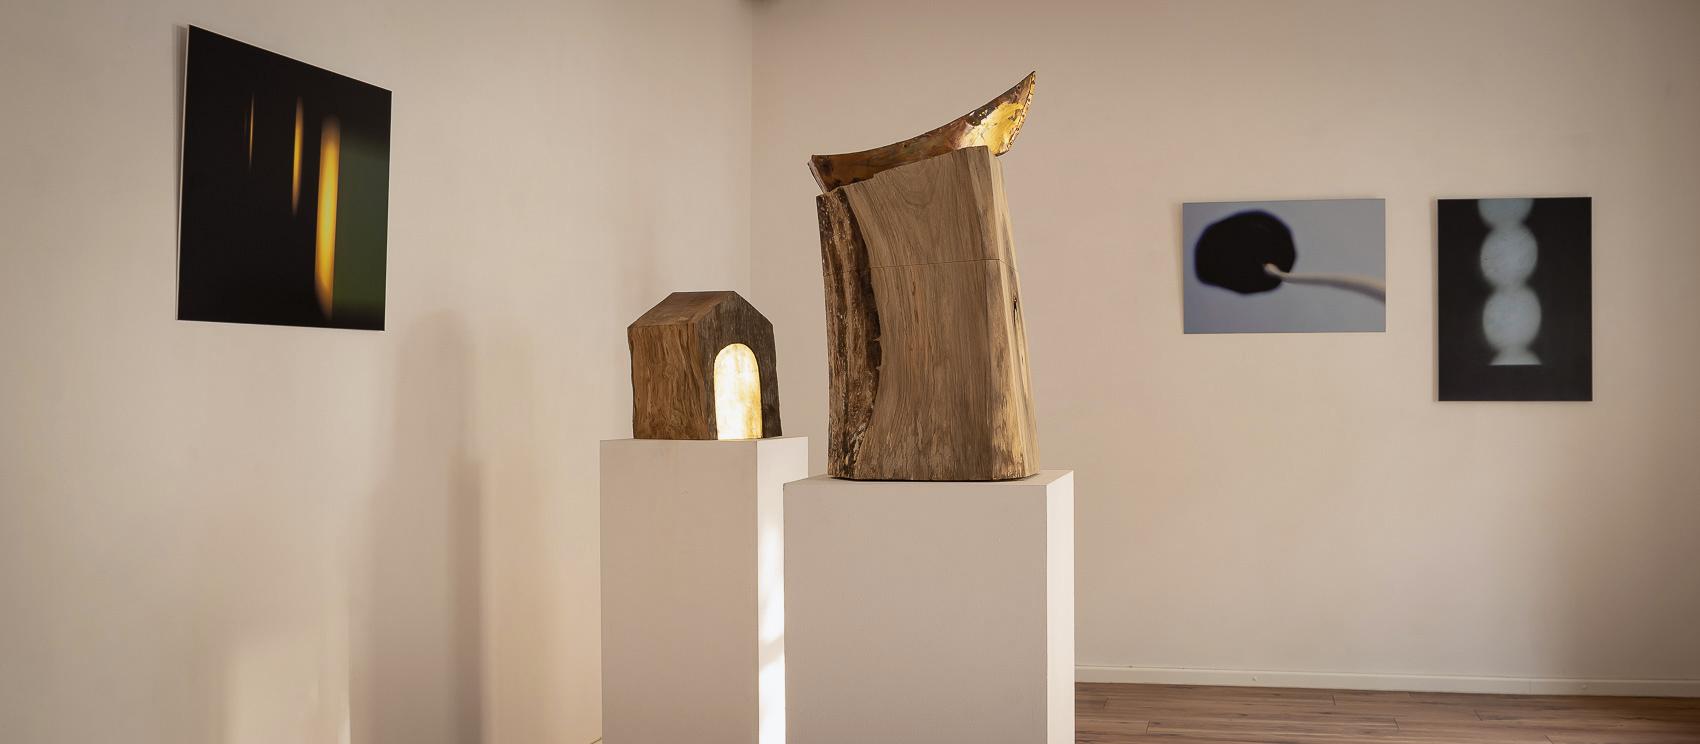 Christian Masche Exhibitions